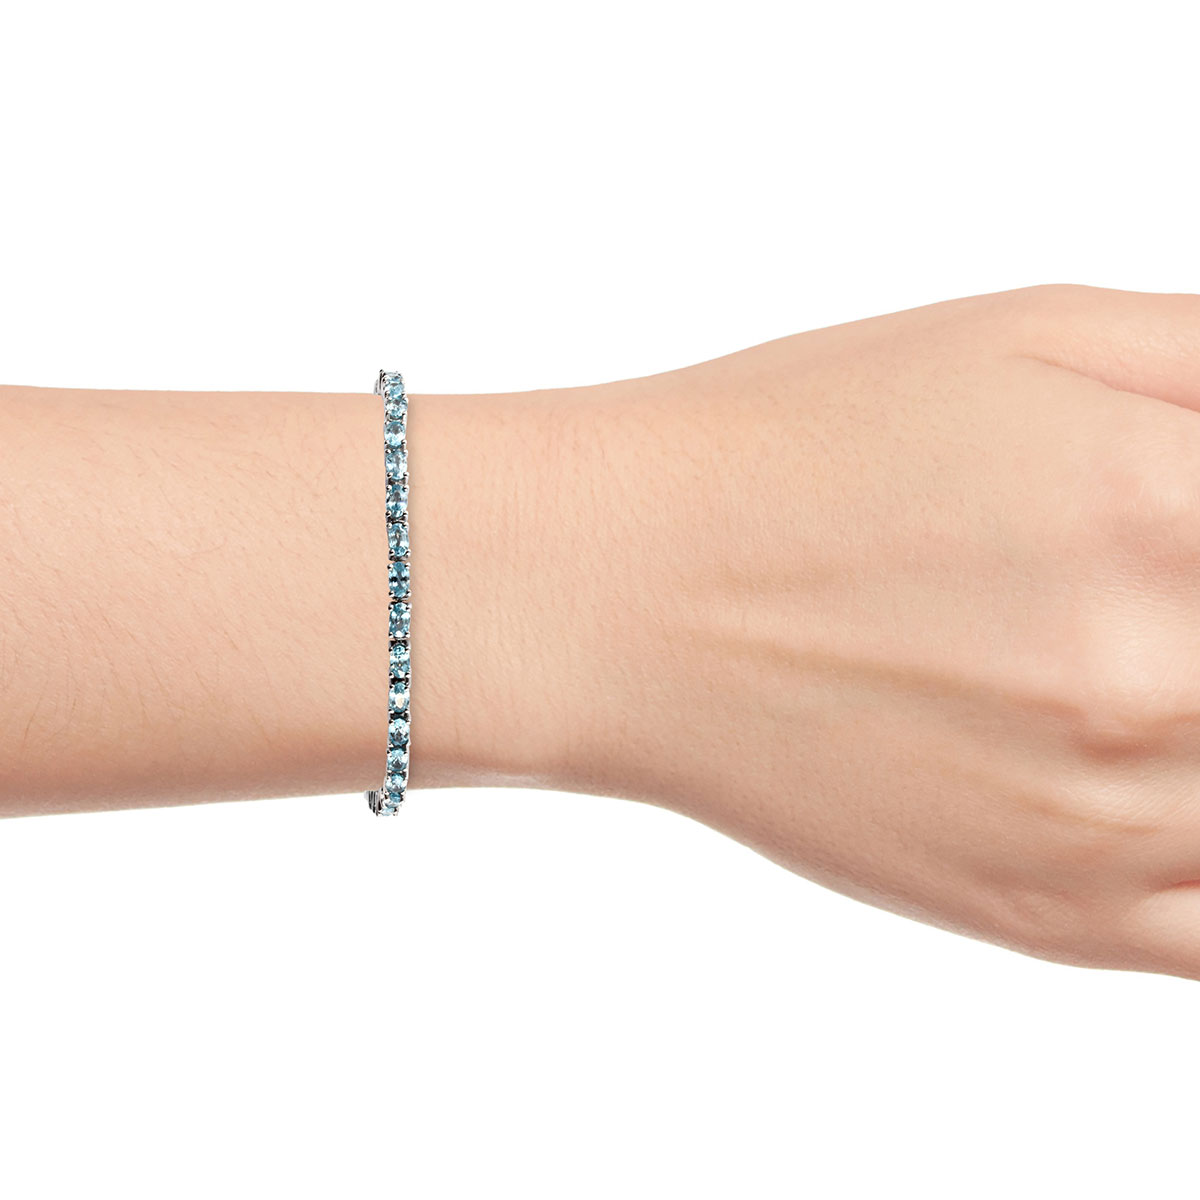 Cambodian Blue Zircon Bracelet in Platinum Over Sterling Silver (8.00 In) 14.35 ctw